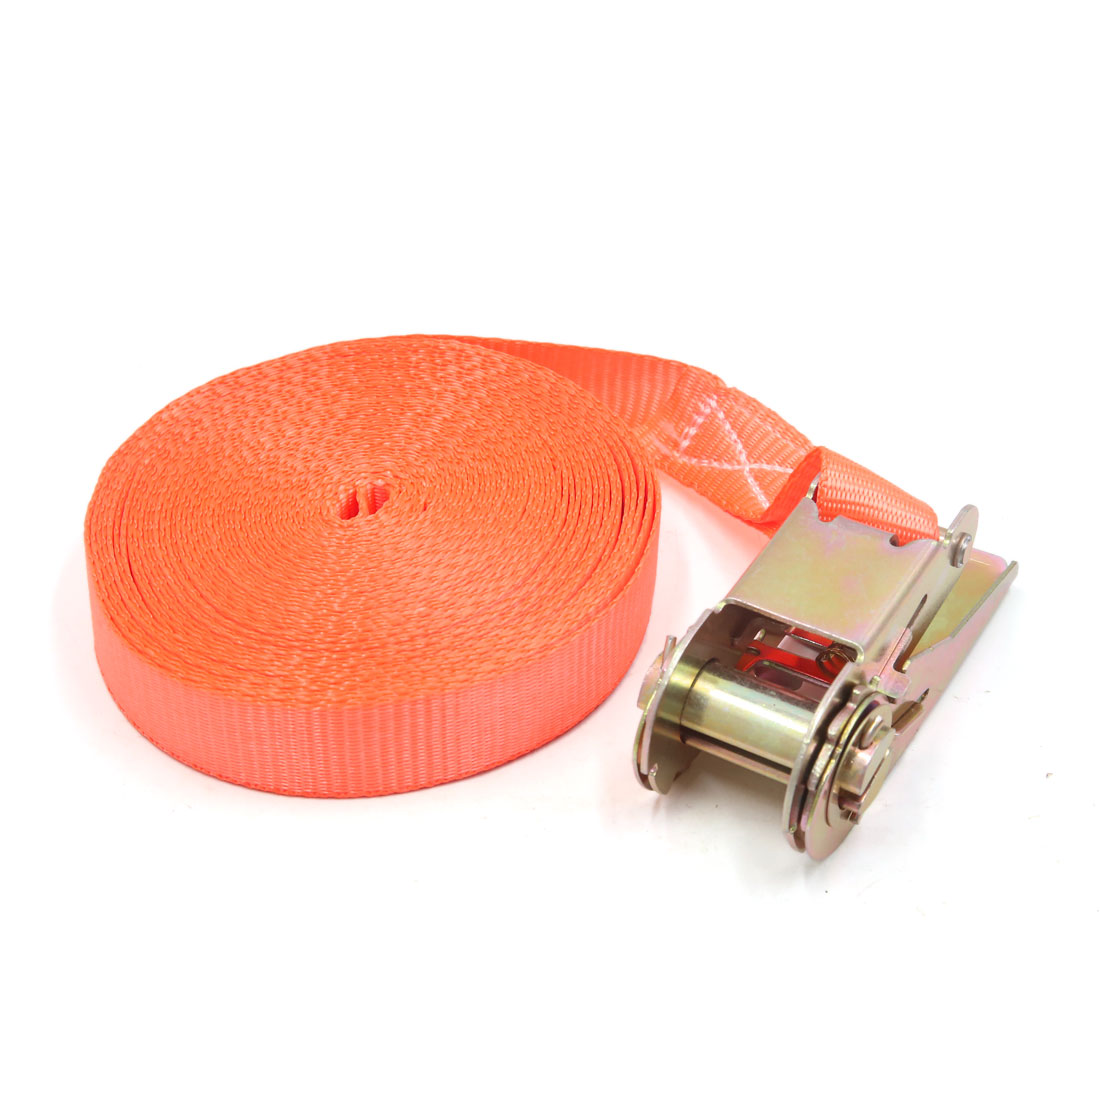 25mm x 10m Orange Polyester Ratchet Tie Down Cargo Straps for Car Vehicle